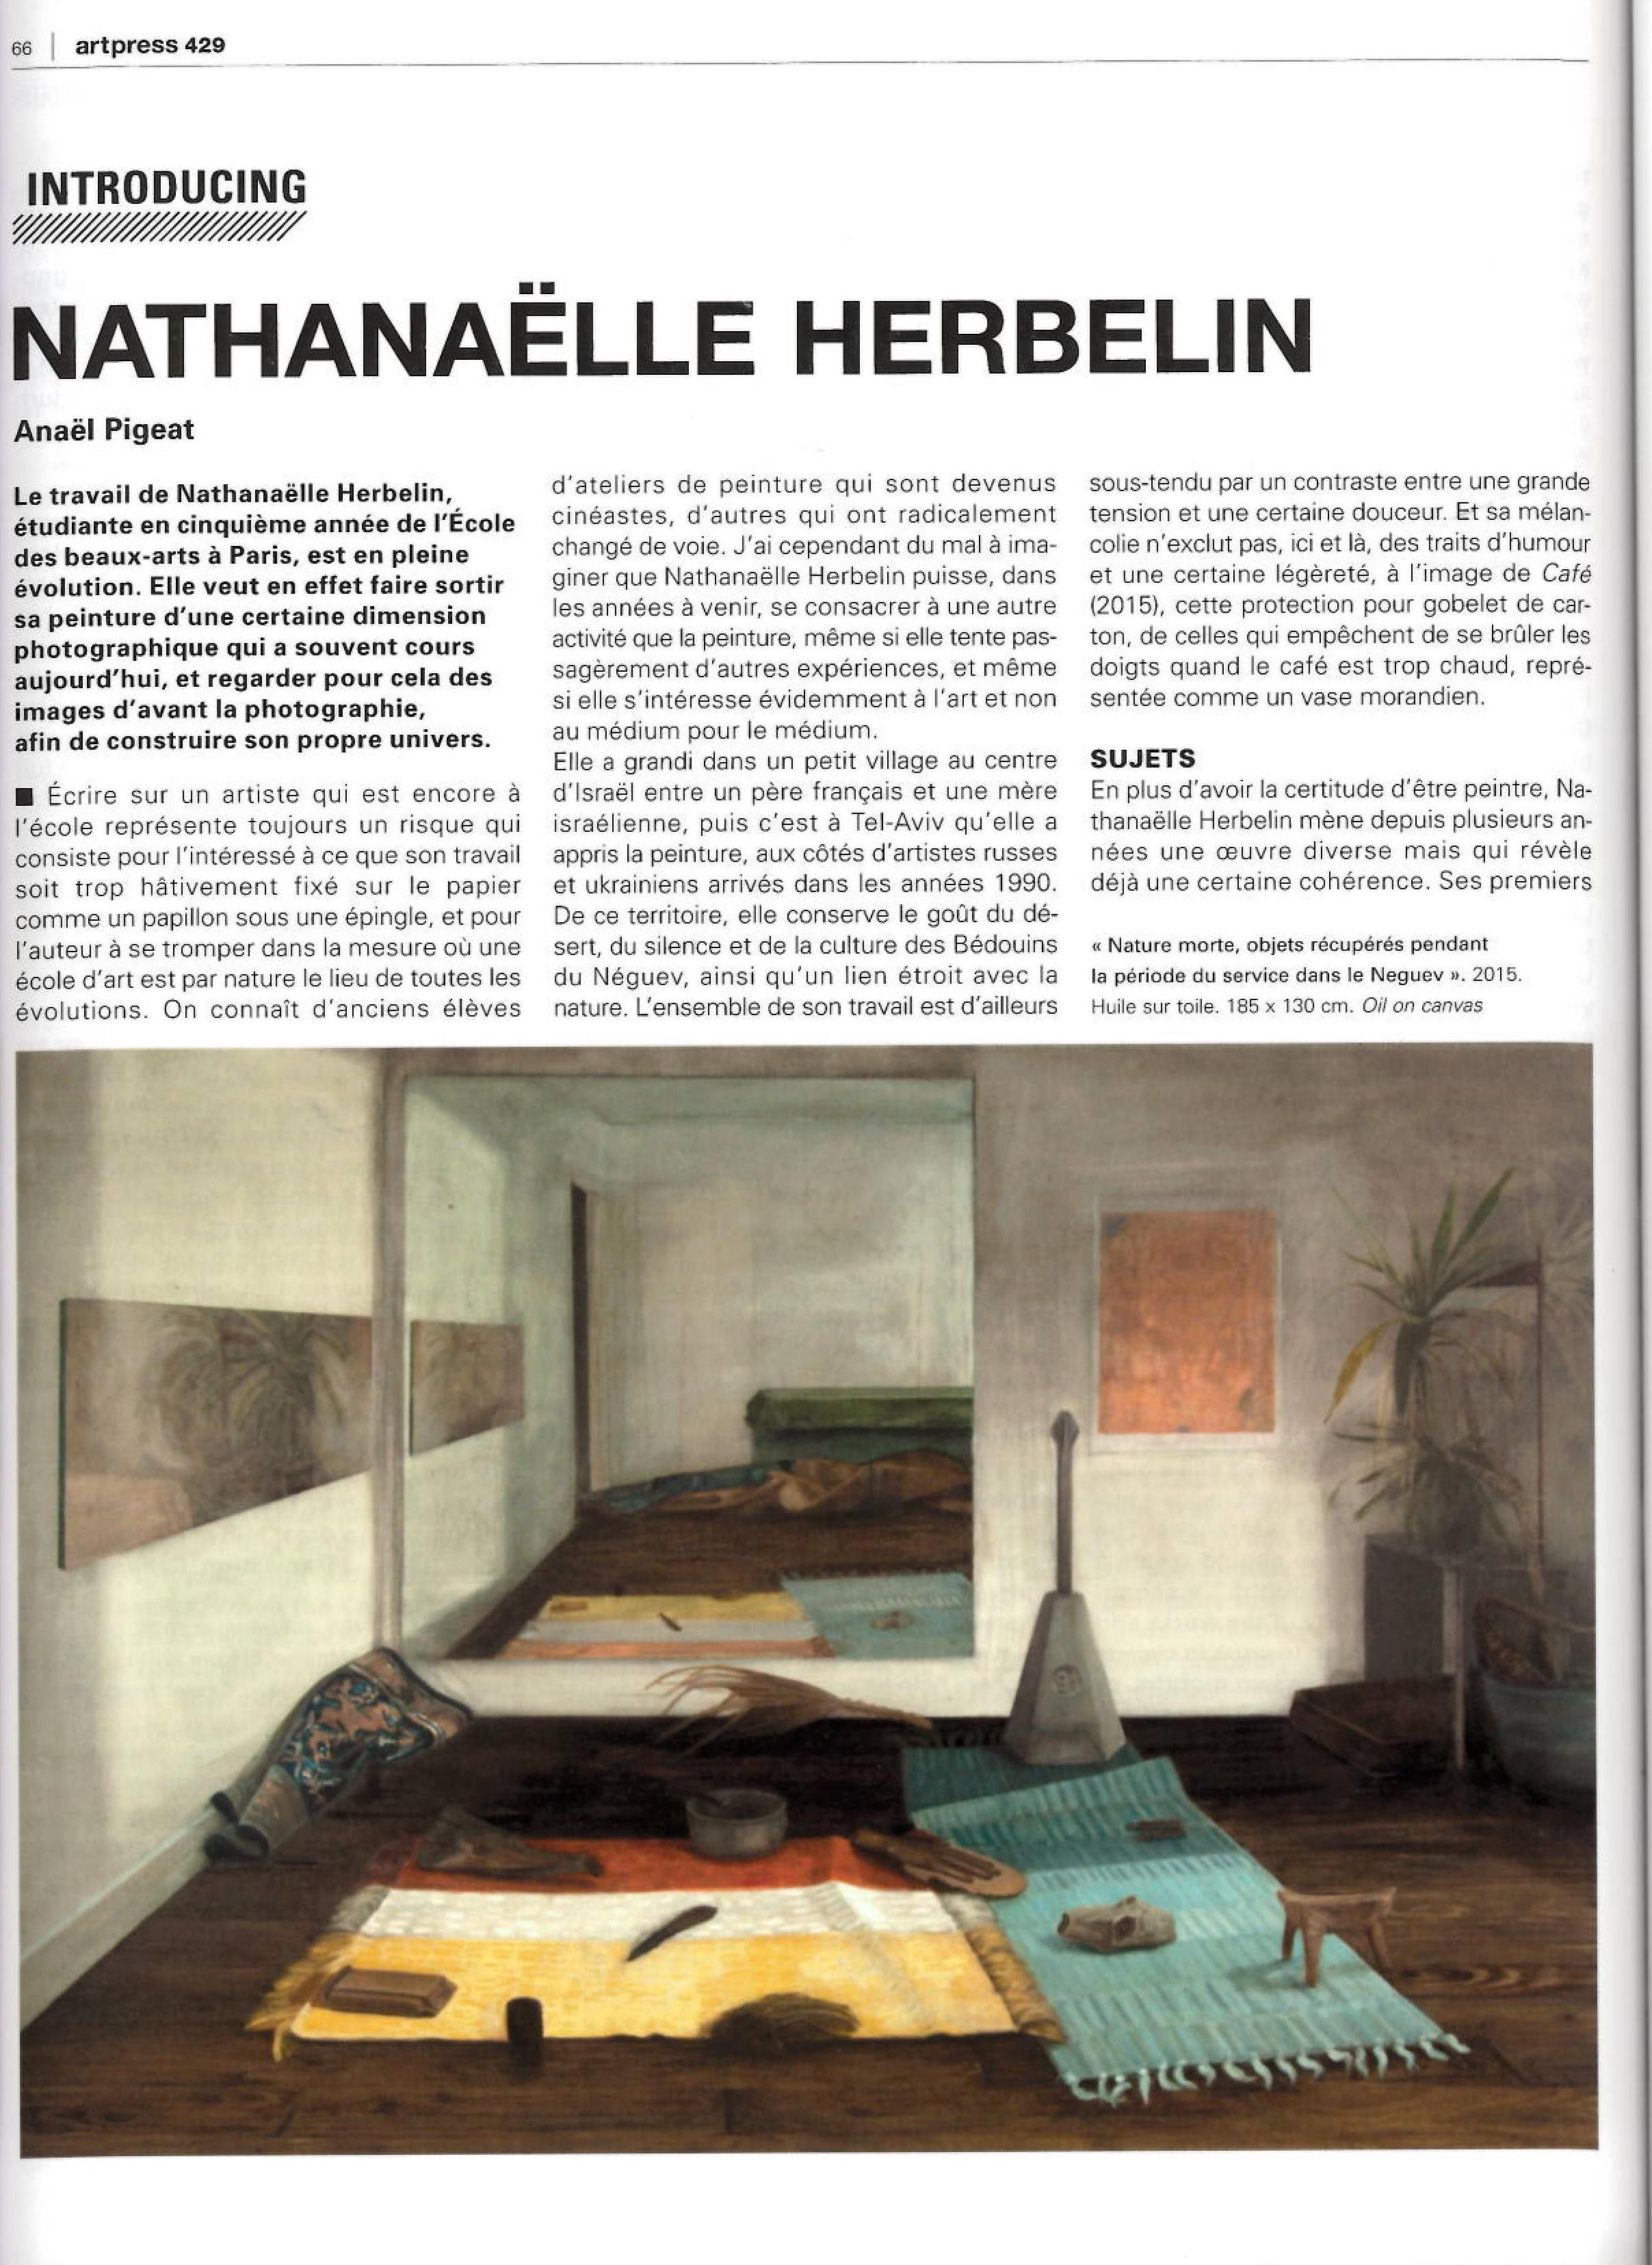 Artpress : Nathanaëlle Herbelin1